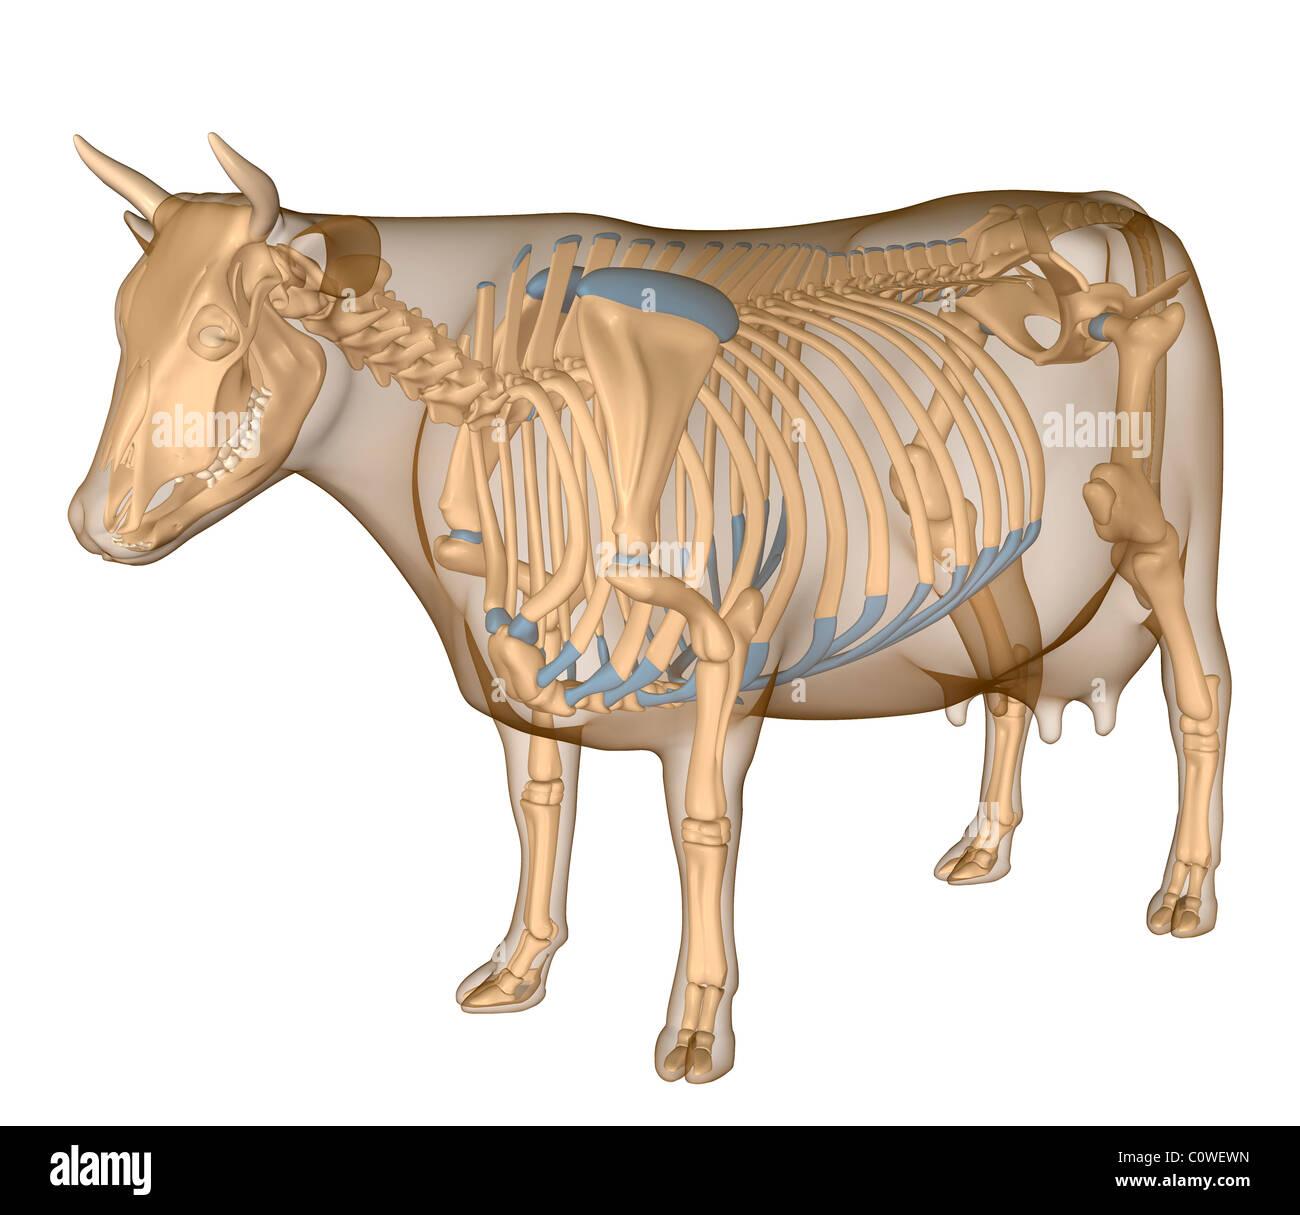 Anatomy of the cow skeleton Stock Photo: 34981233 - Alamy